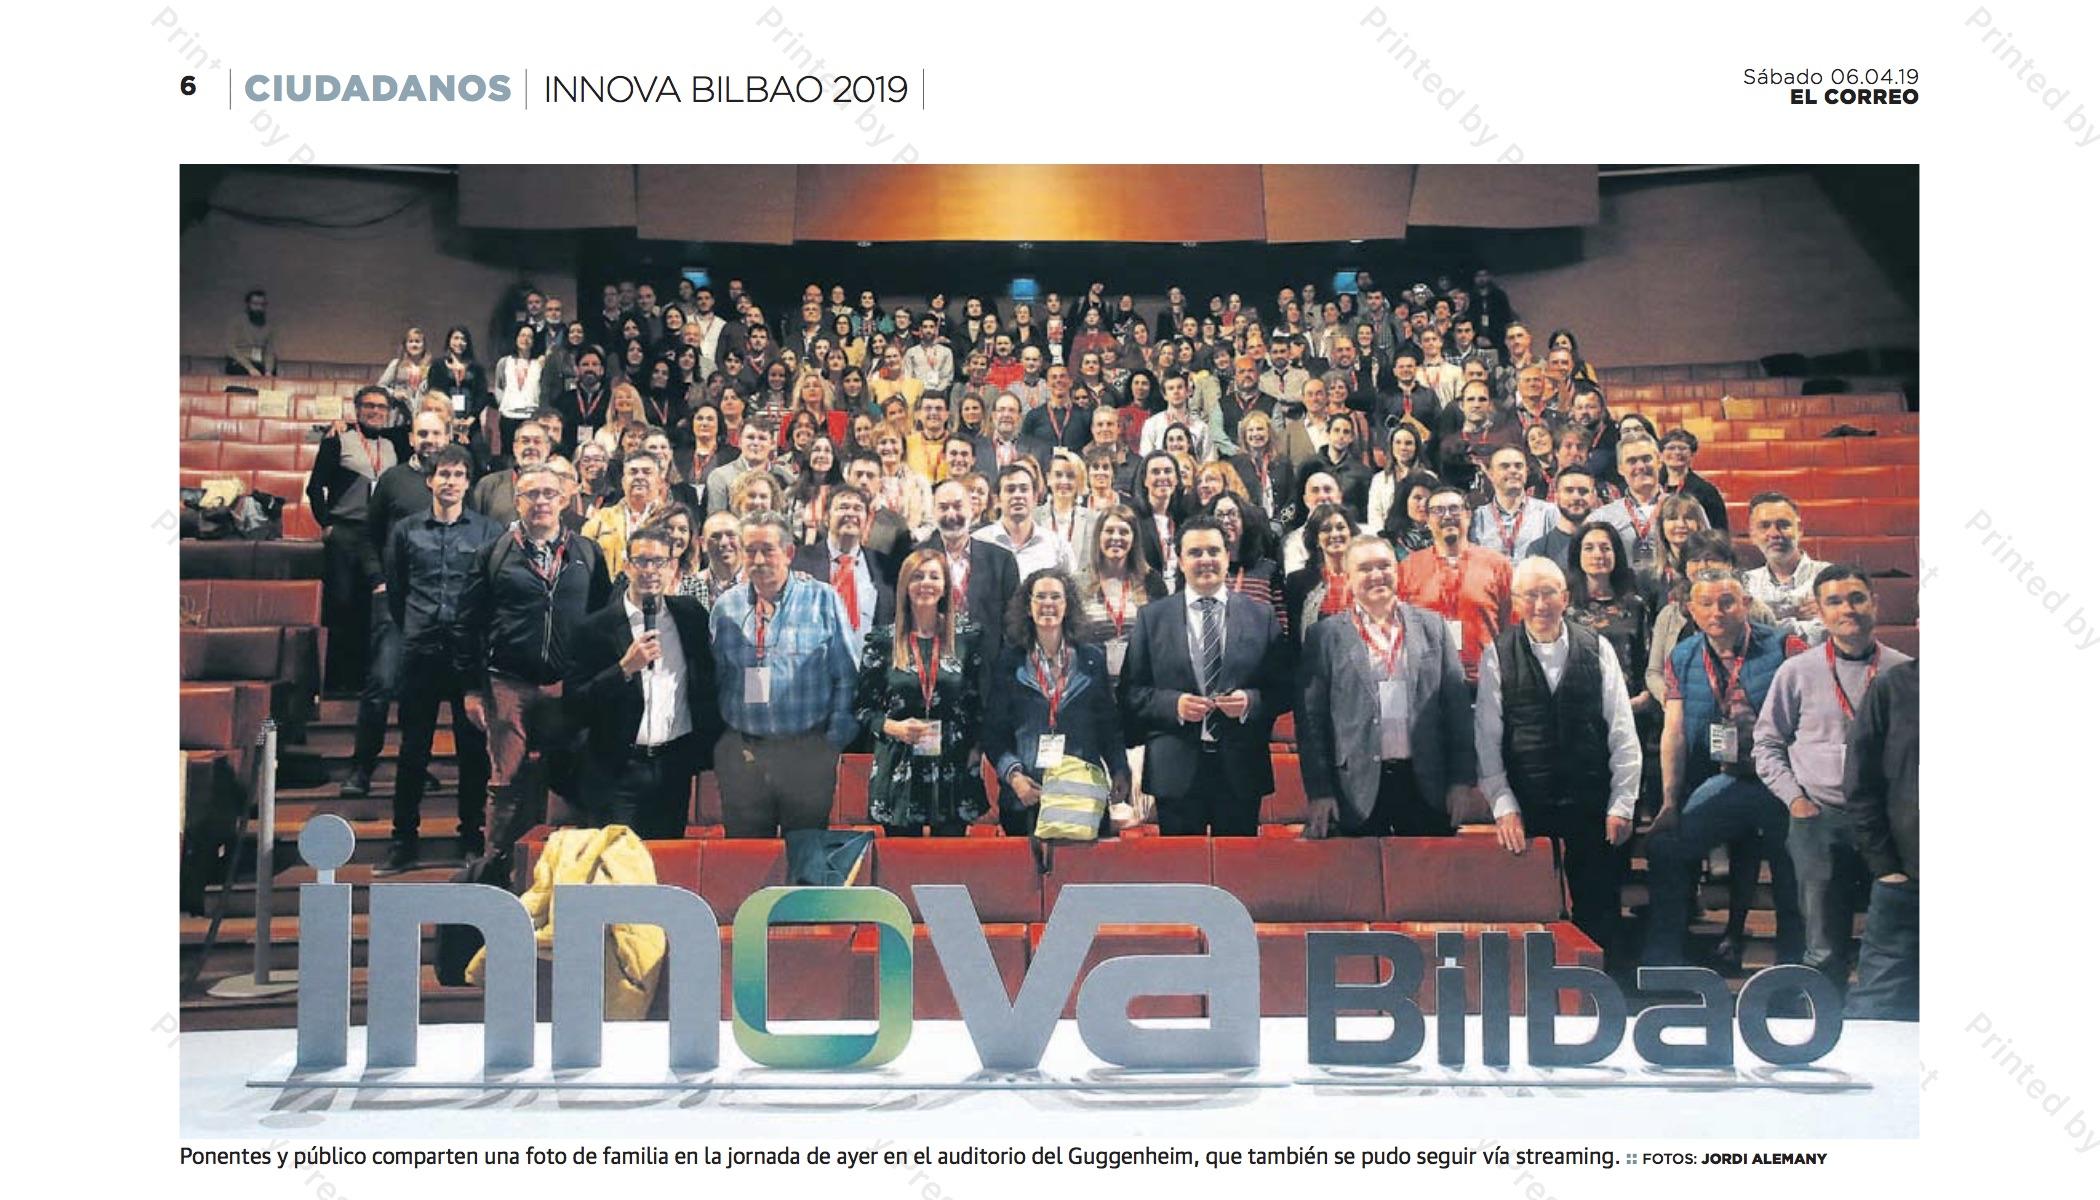 Innova Bilbao 2019 - Foto Familia - El Correo